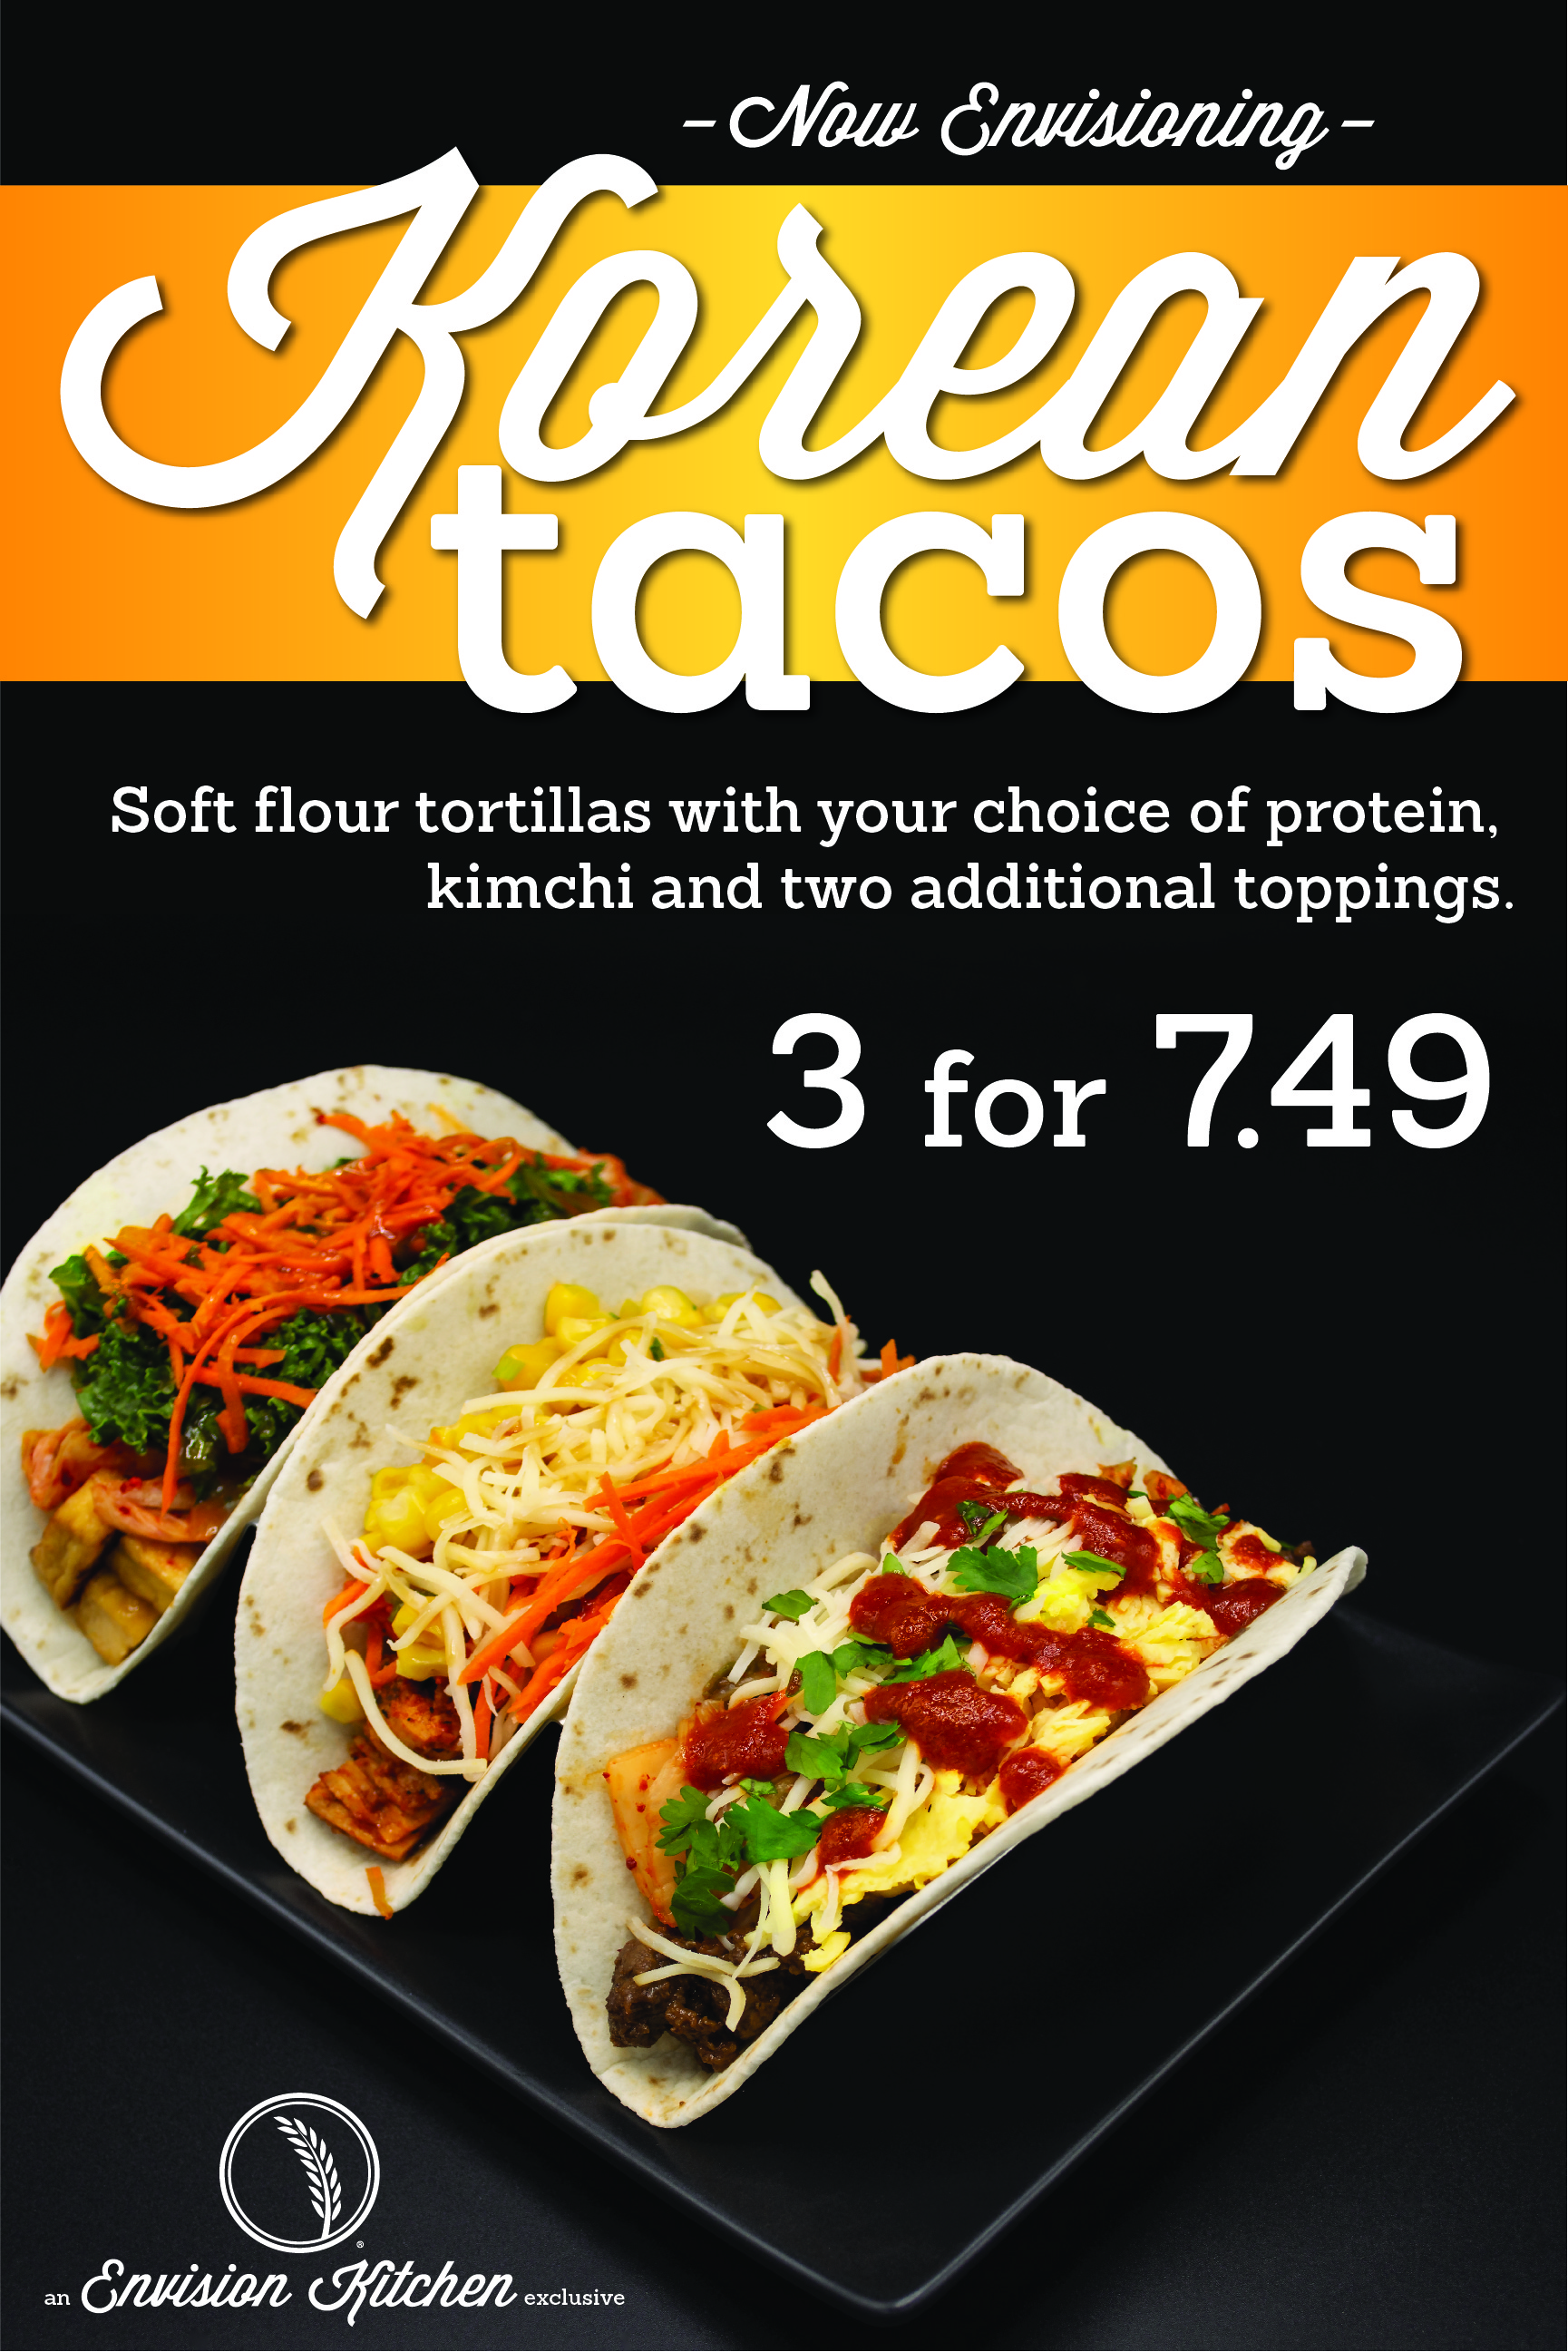 korean taco bragger board-01.jpg